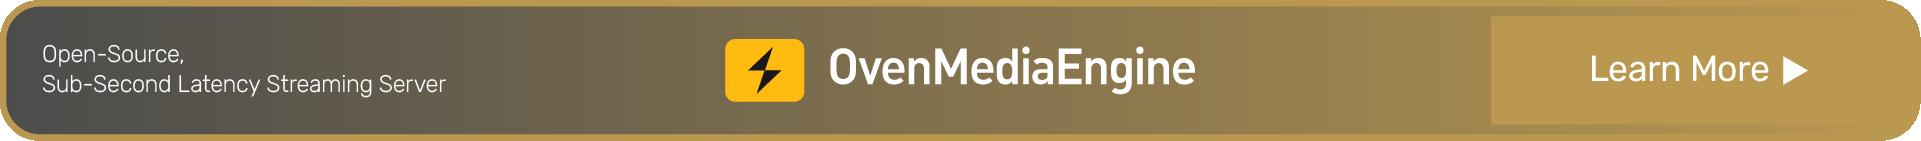 OvenMediaEngine